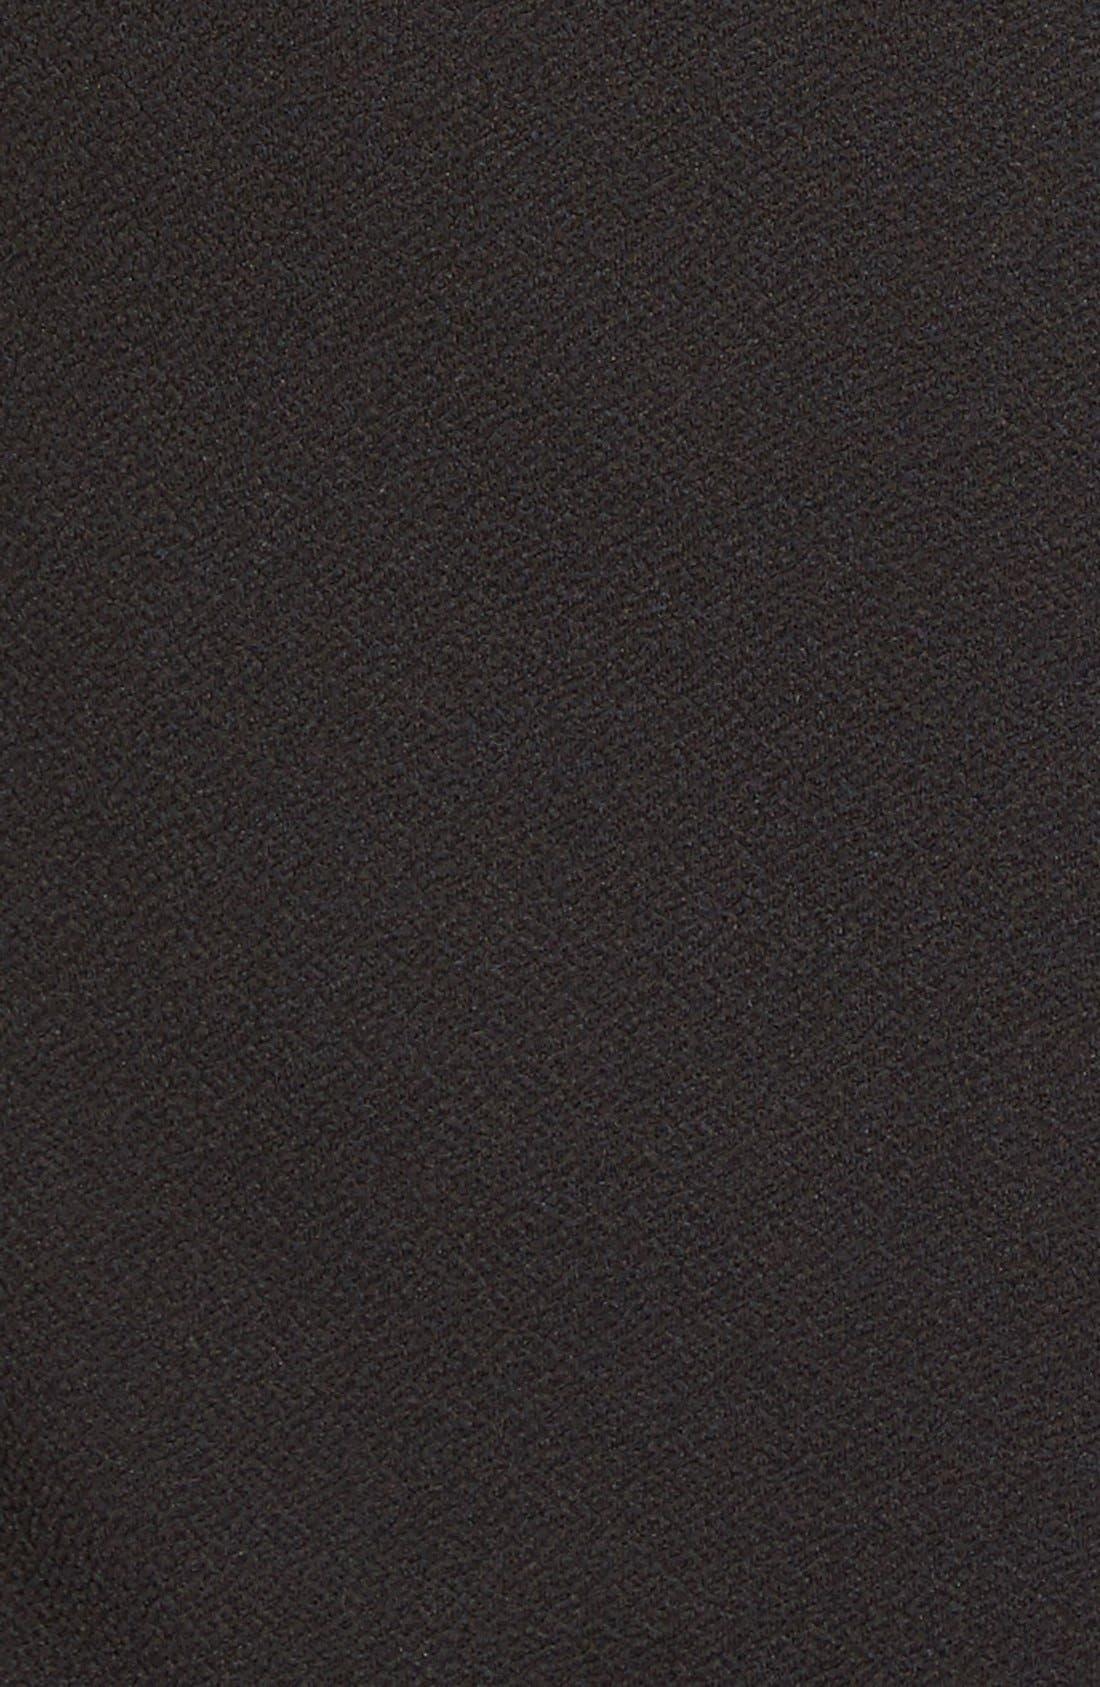 Stretch Crepe Tank Dress,                             Alternate thumbnail 2, color,                             001